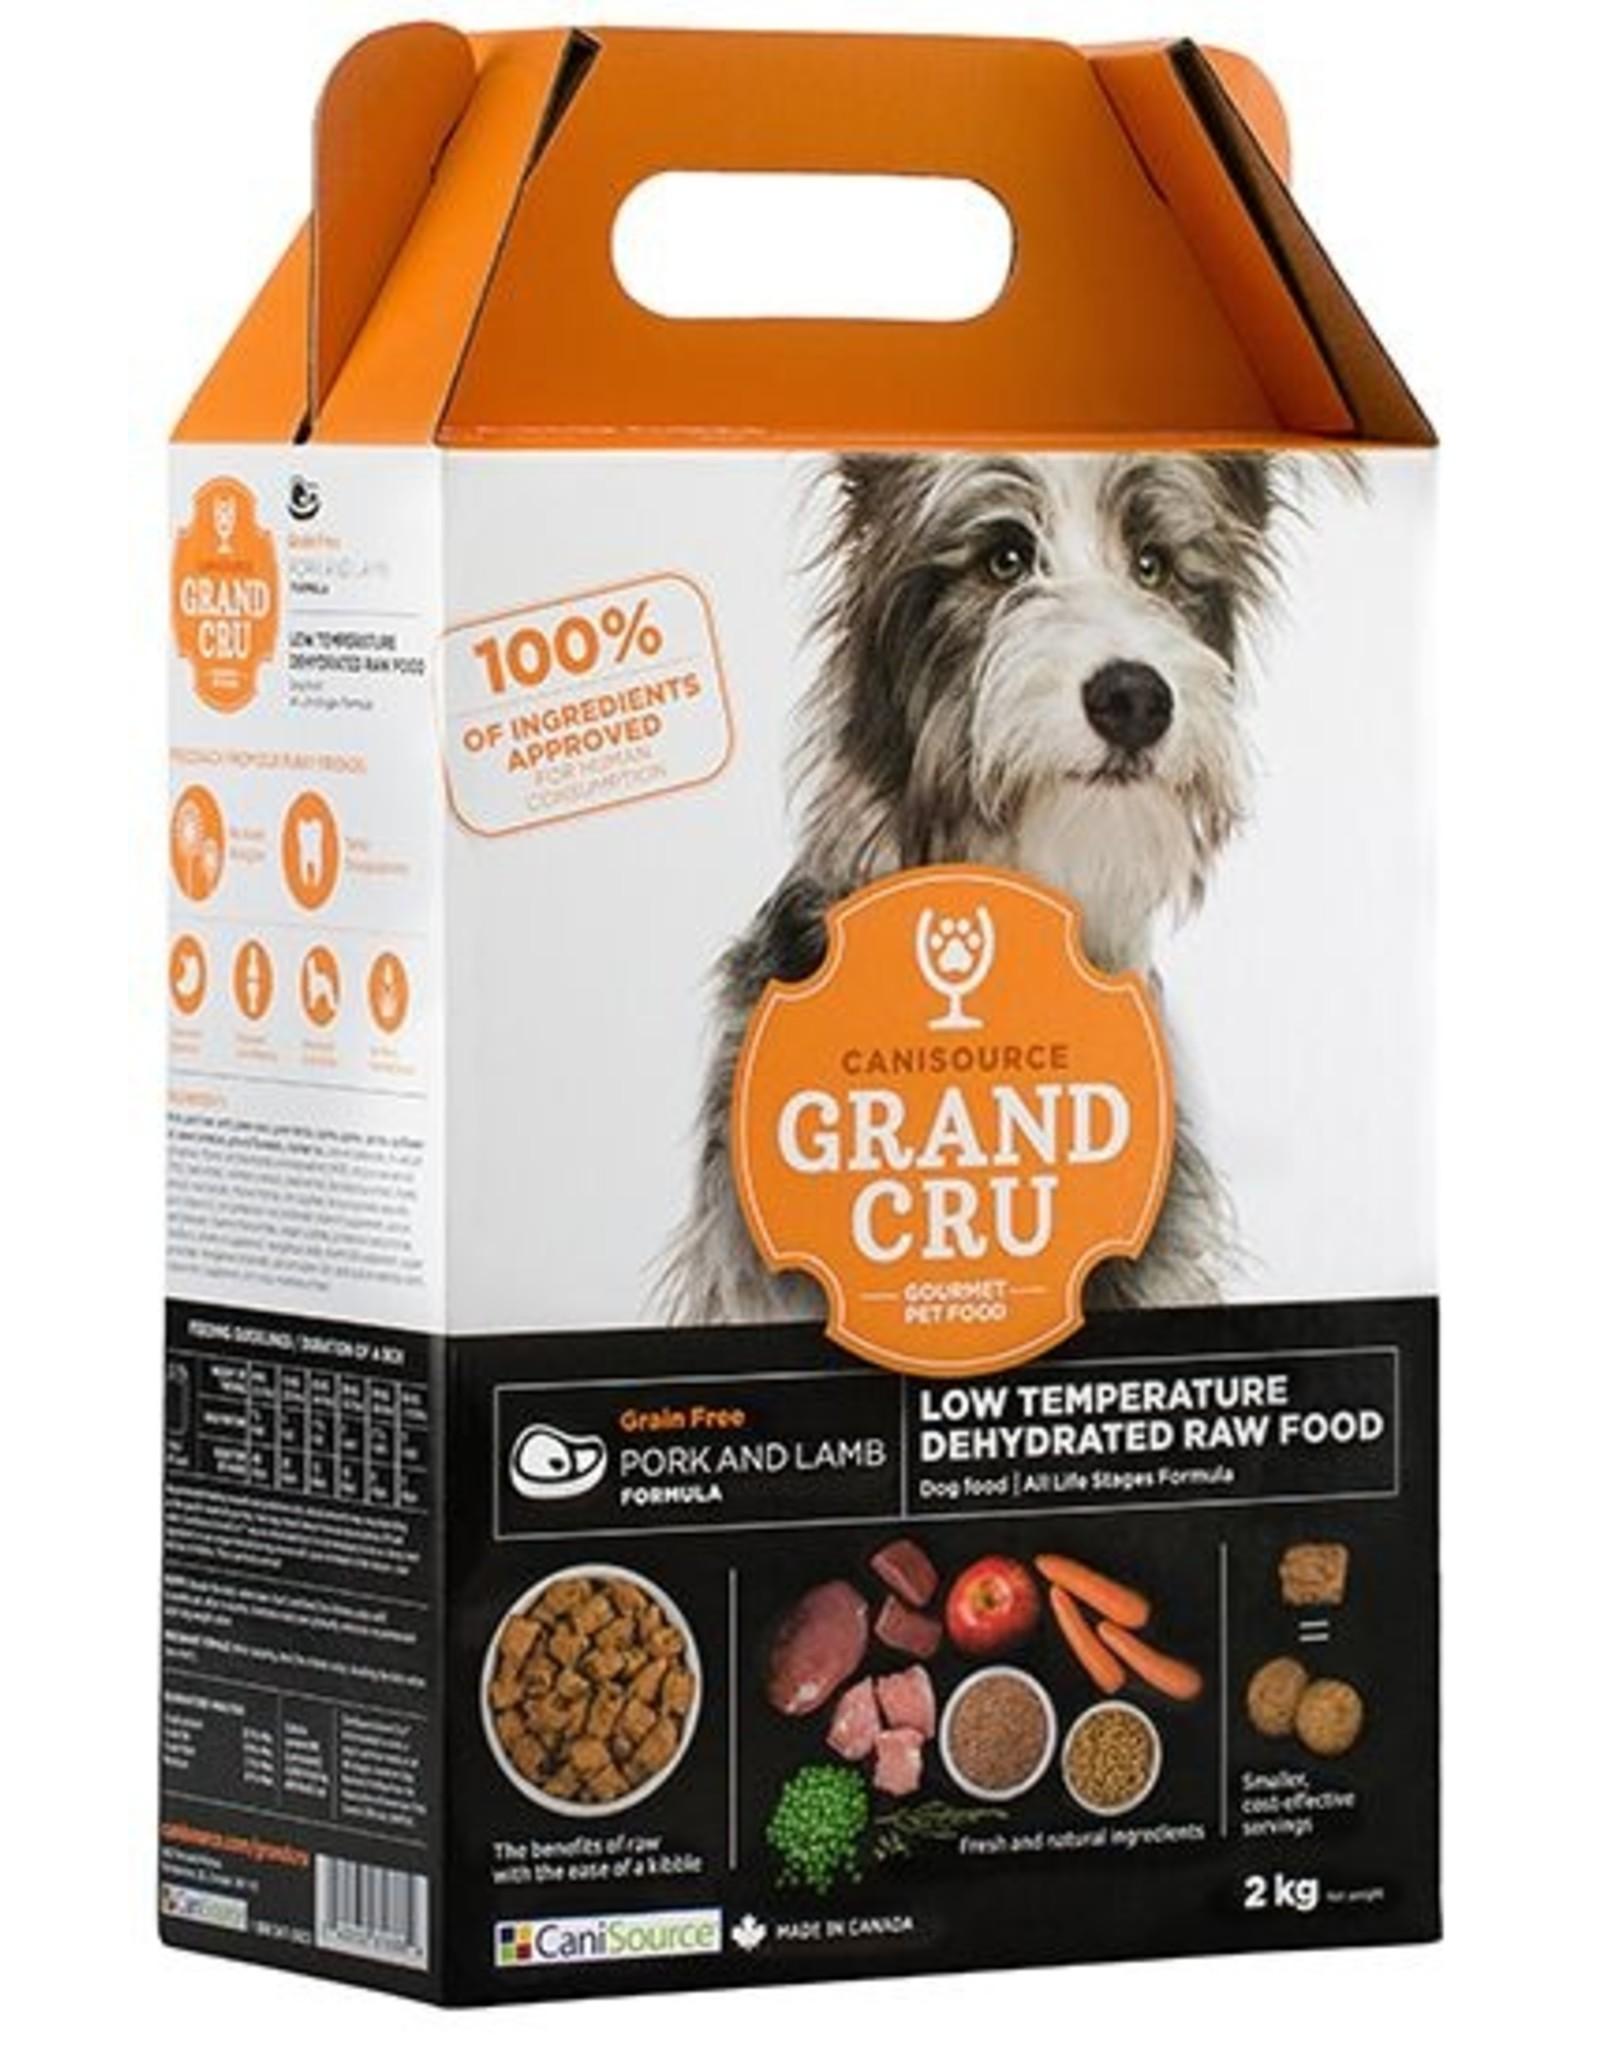 Canisource Canisource Grand Cru Dog Pork & Lamb